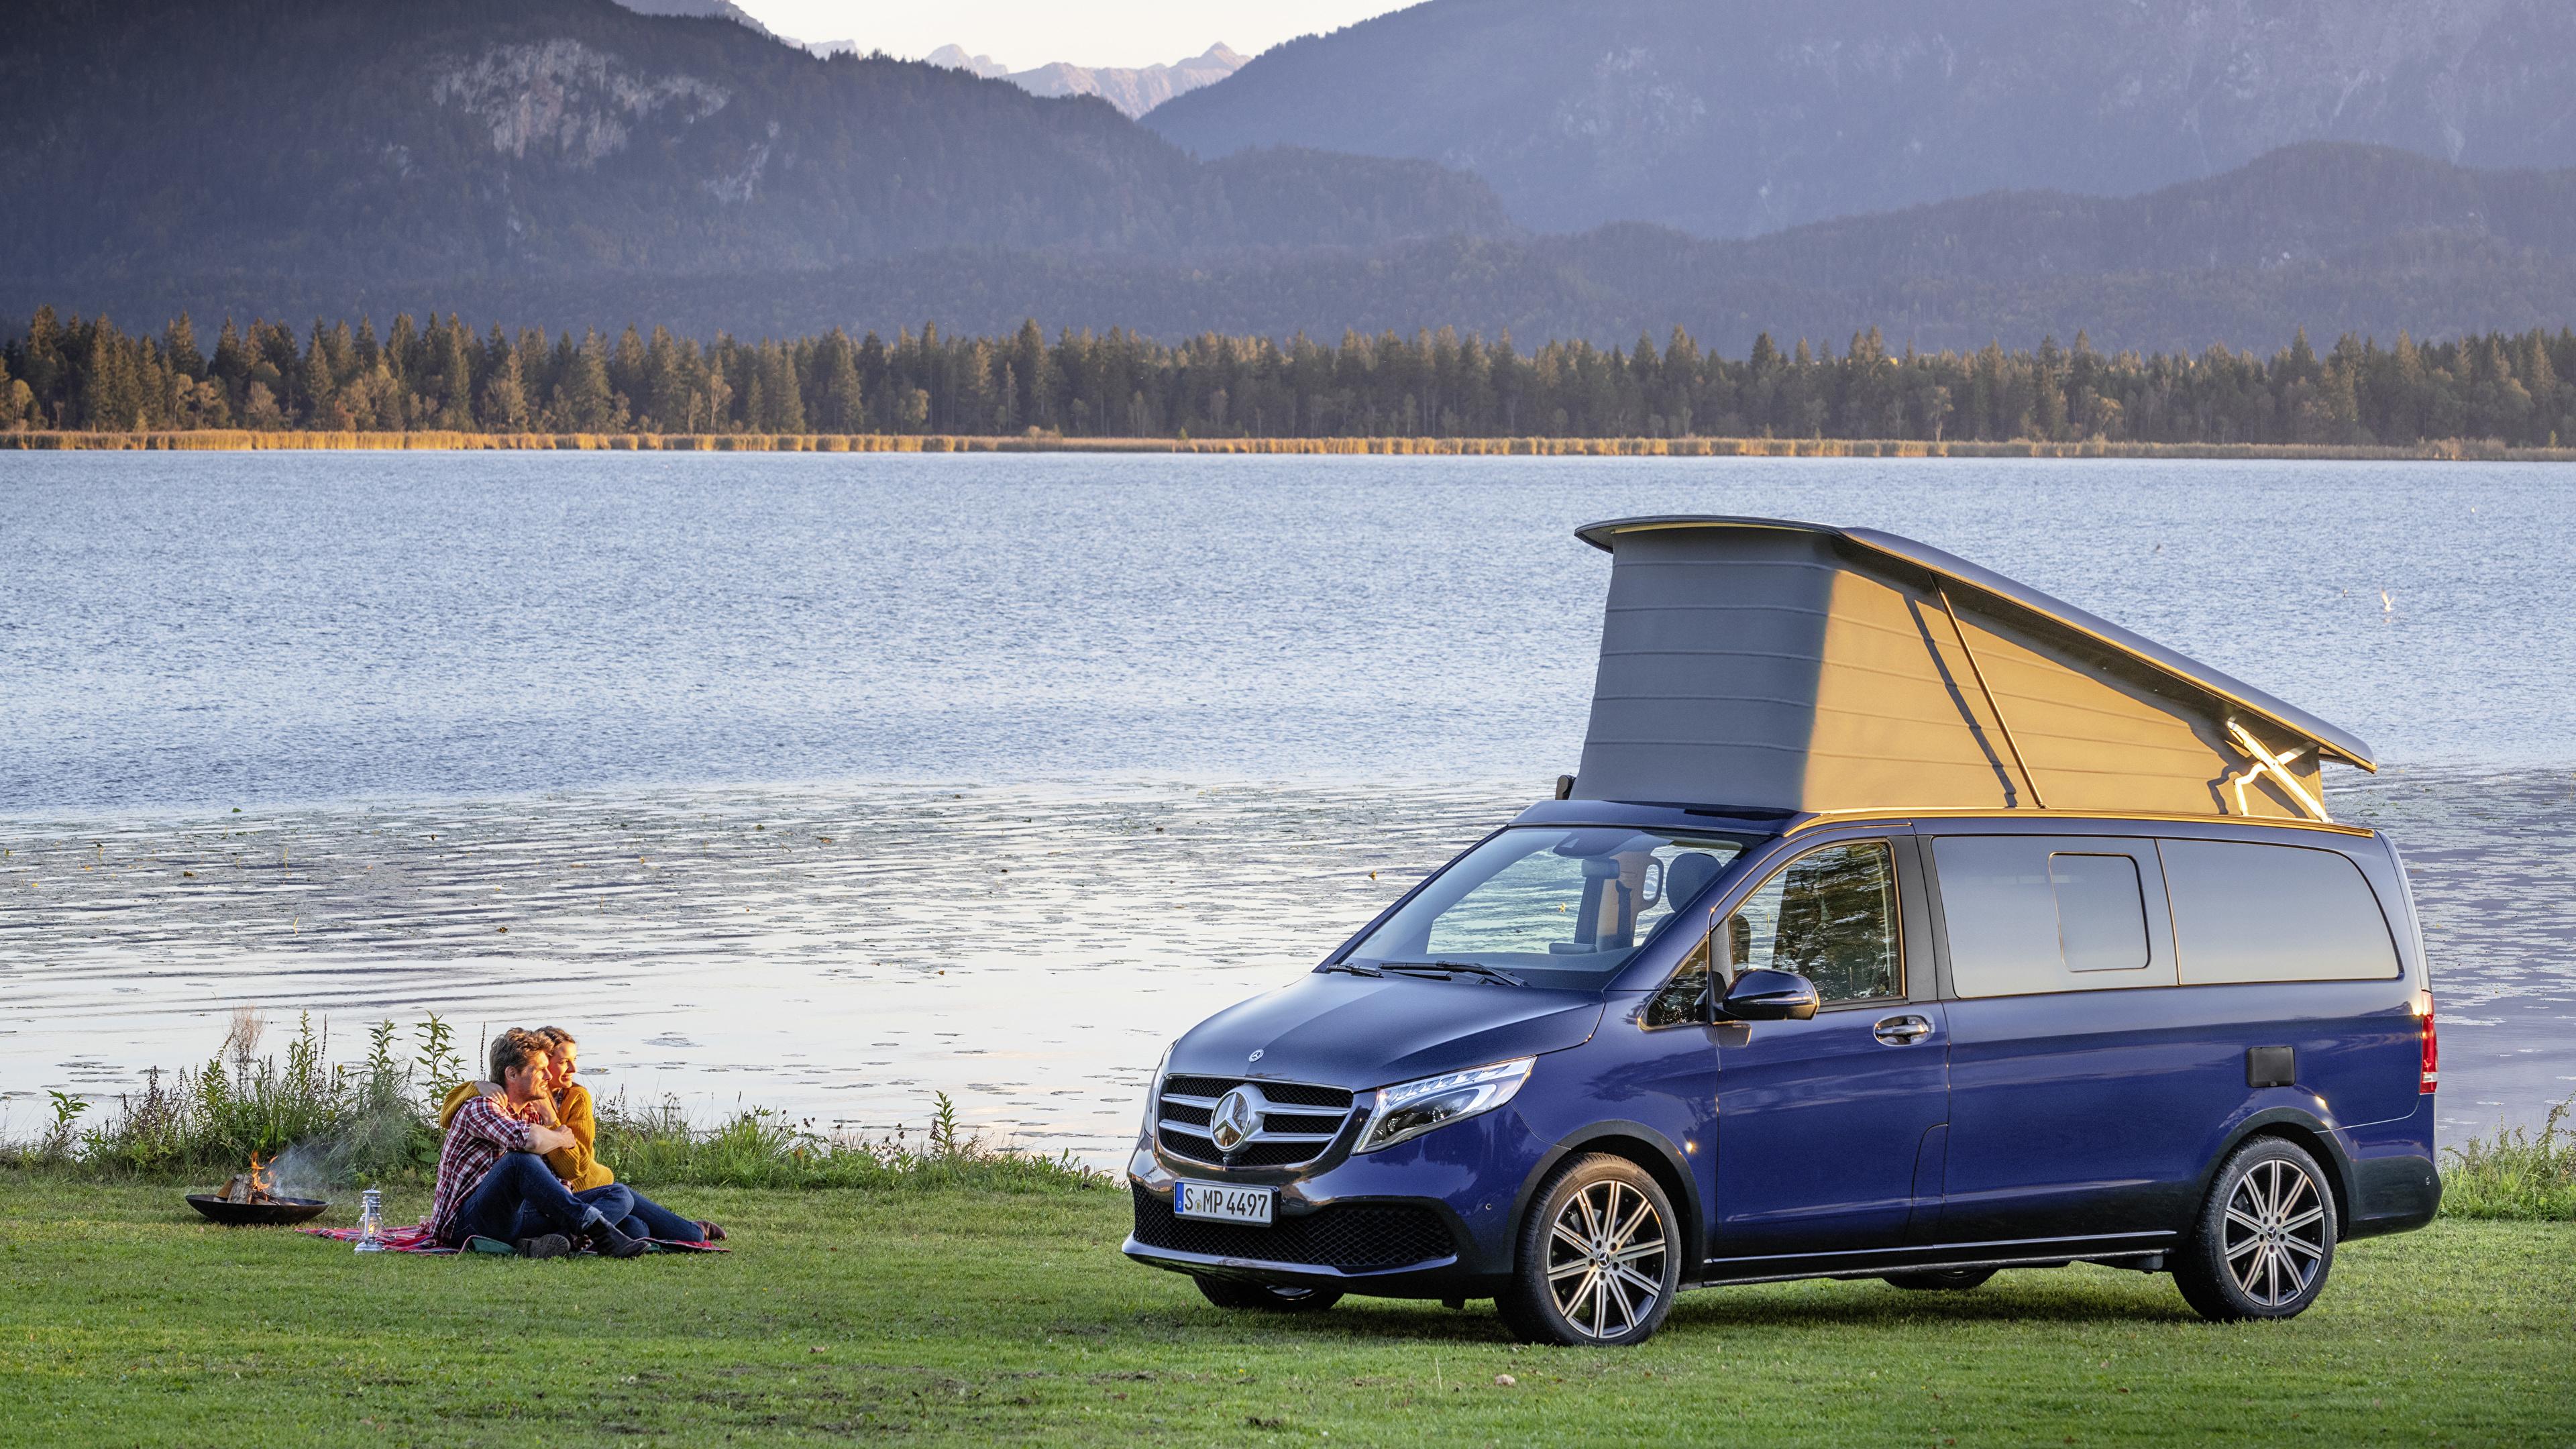 Фото Mercedes-Benz Пикник 2019 Marco Polo Worldwide Синий авто Металлик 3840x2160 Мерседес бенц пикнике синих синие синяя машина машины автомобиль Автомобили